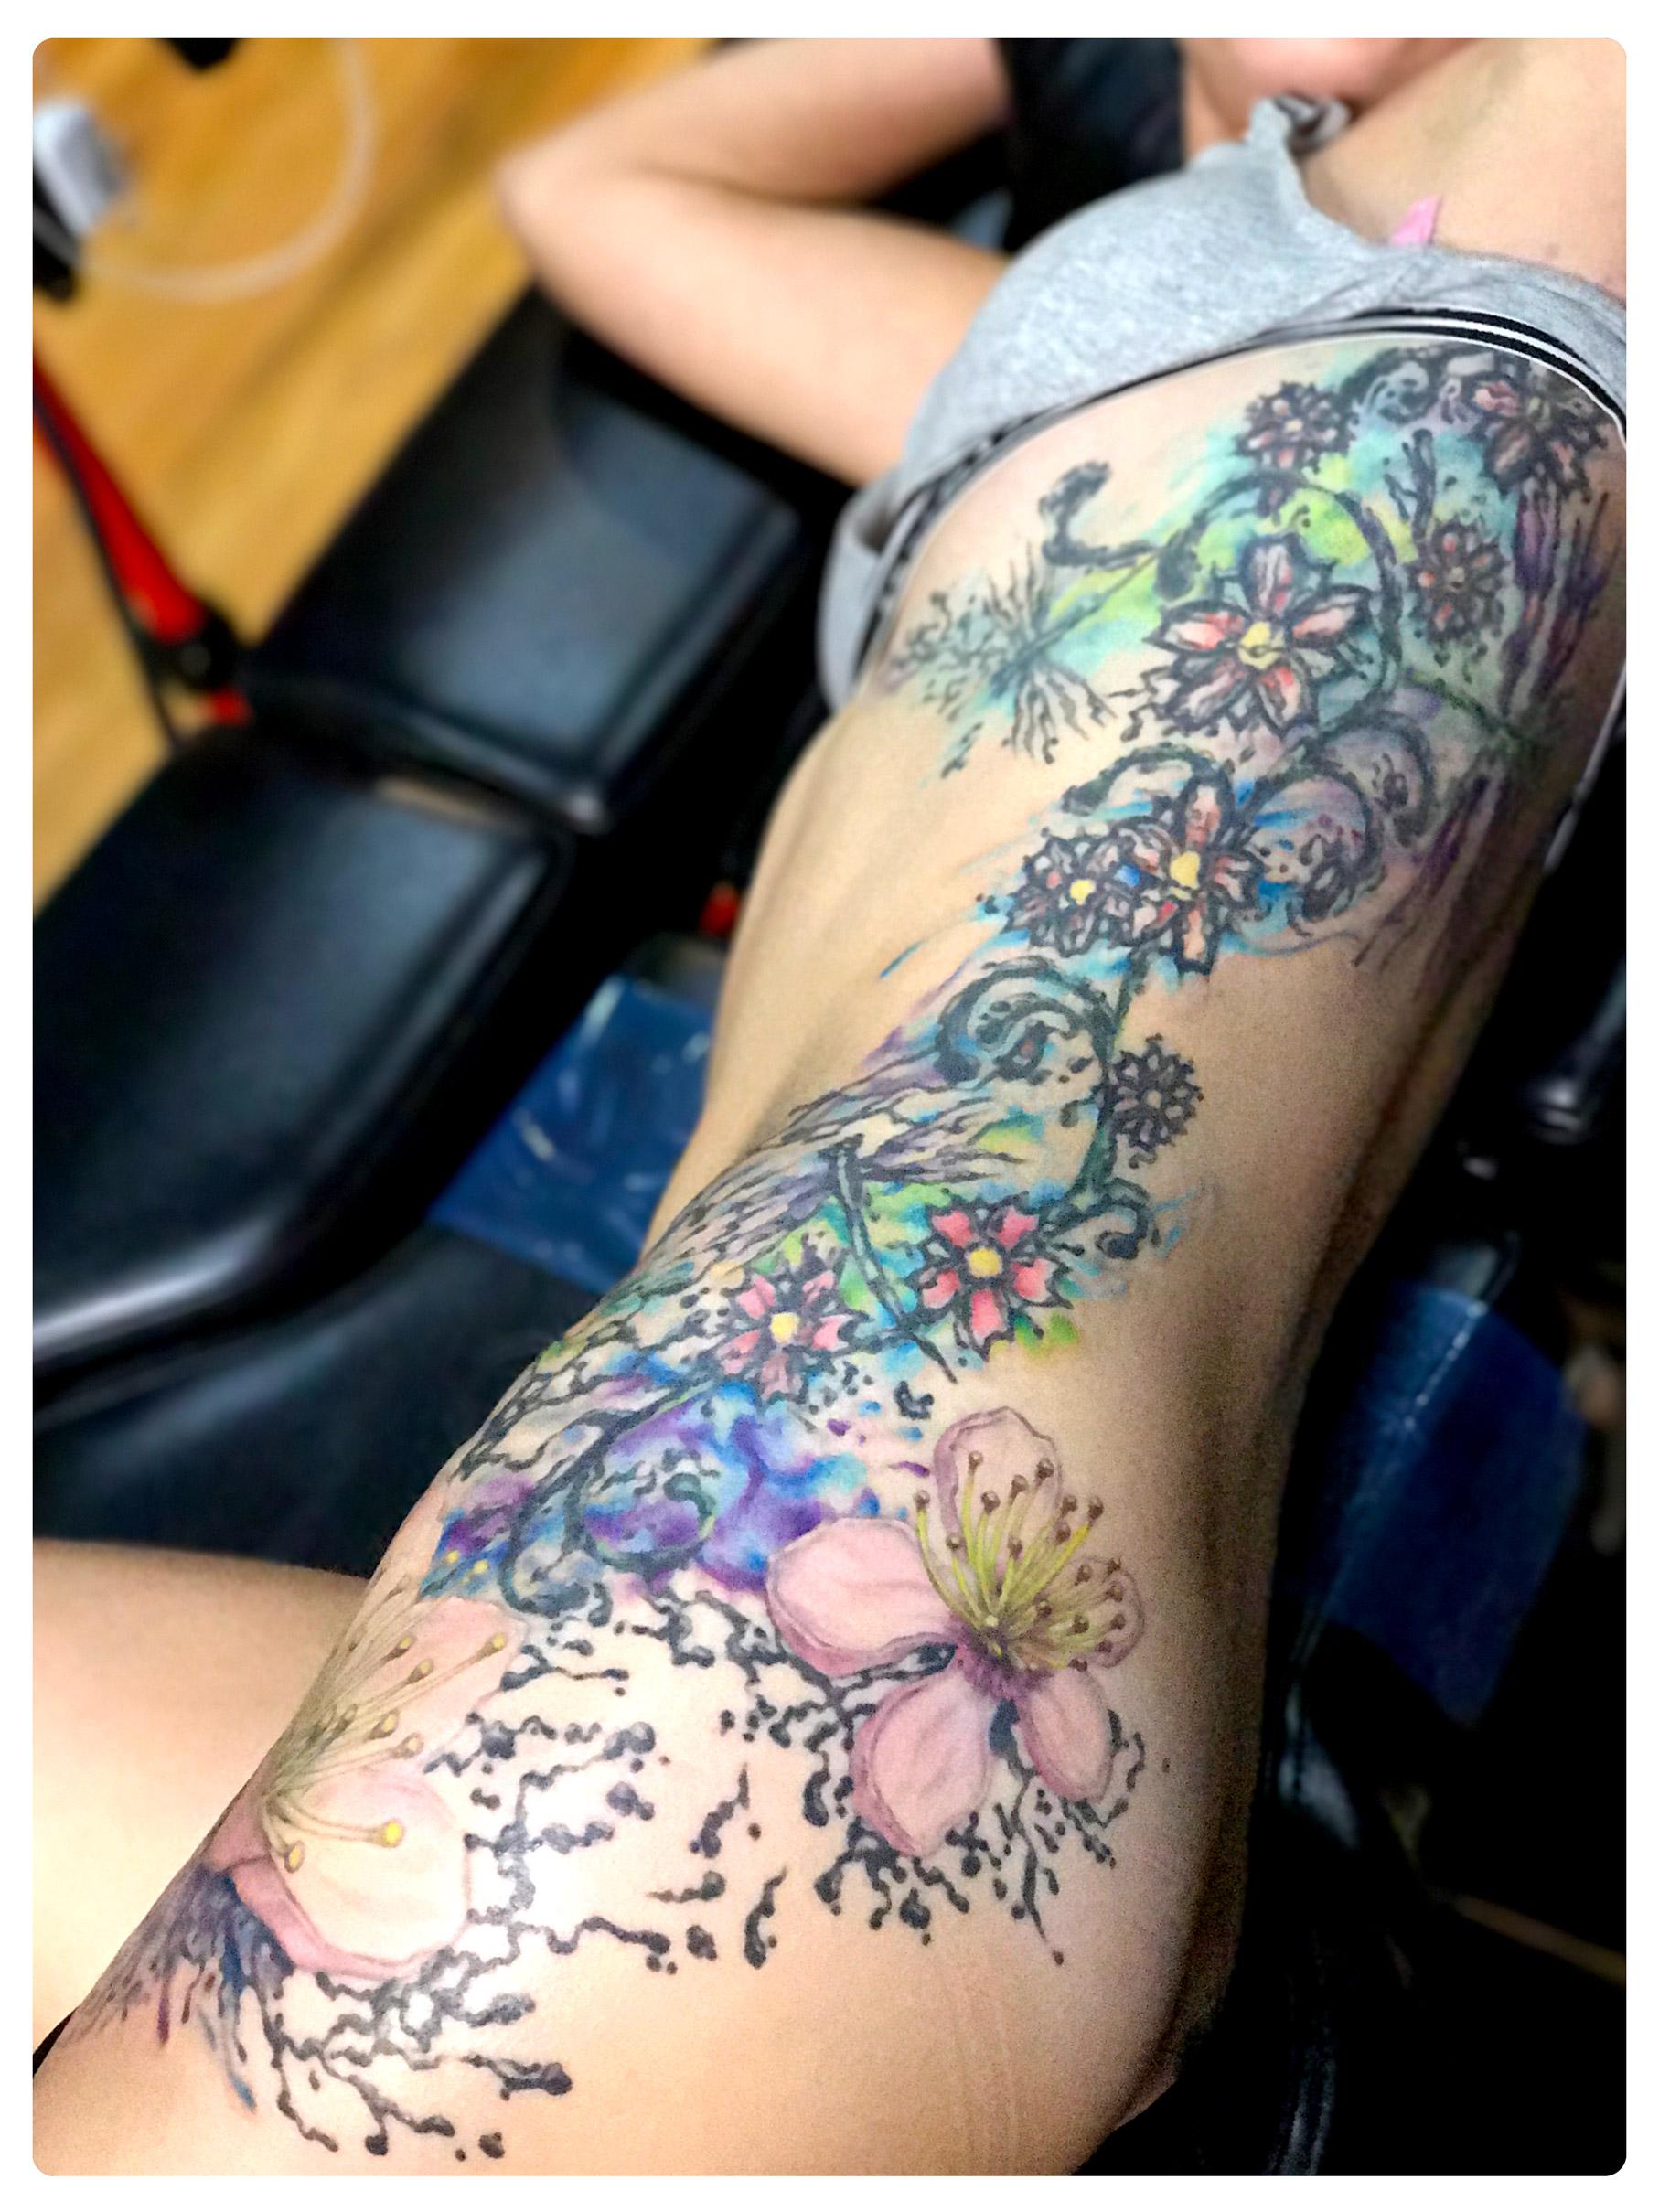 In-progress Tattoo by Shane Acuff